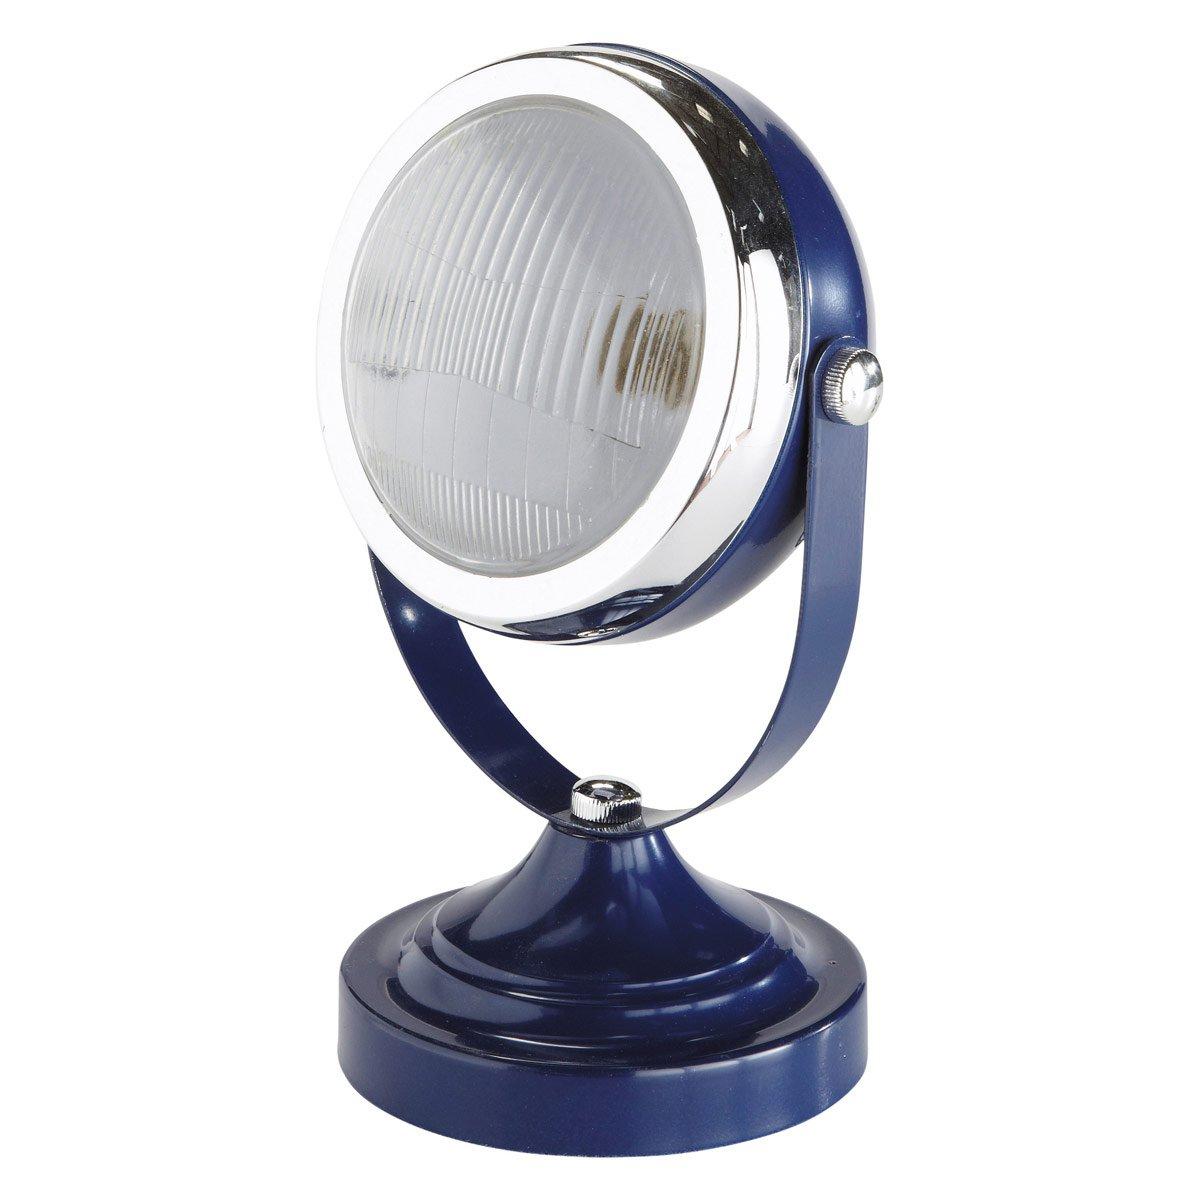 MDM enfant Lampe phare de voiture